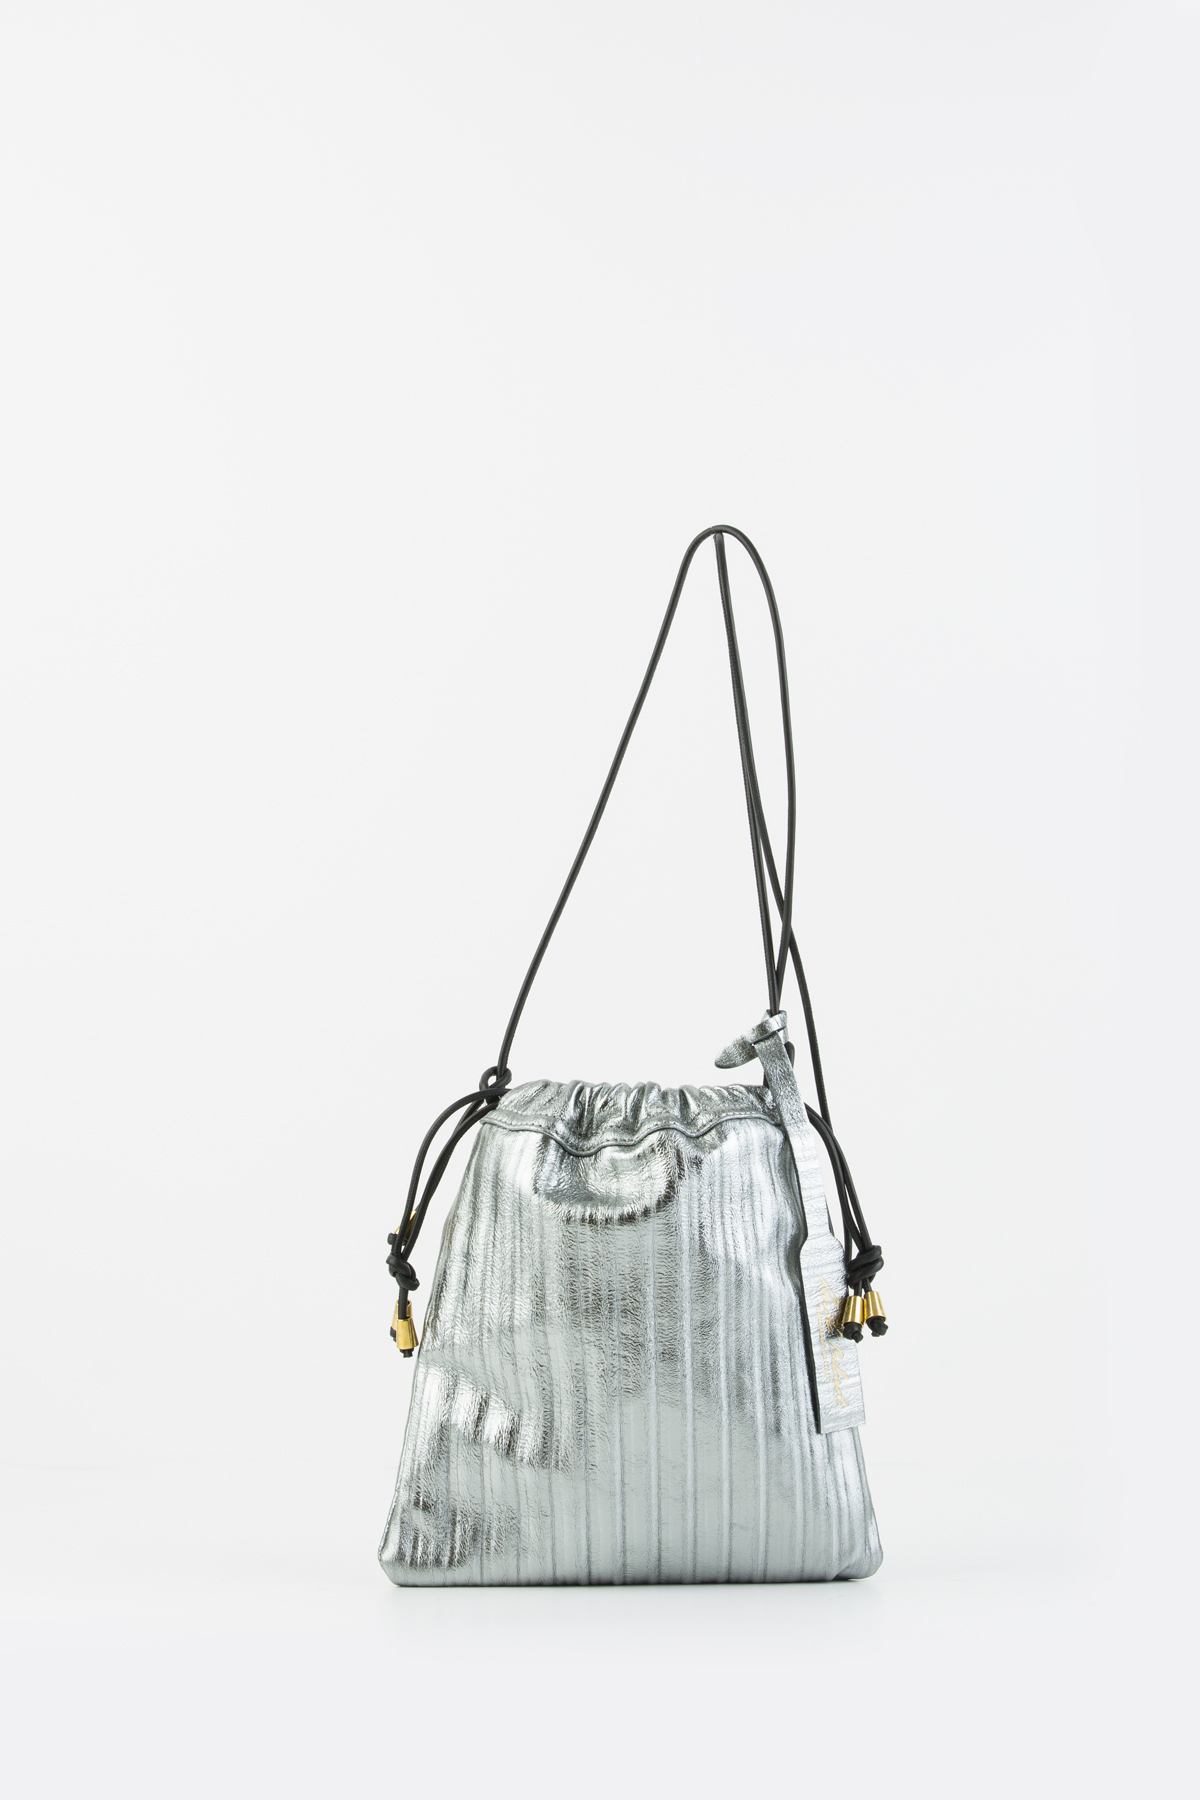 pocket-pleated-leather-silver-bag-anita-billardi-matchboxathens